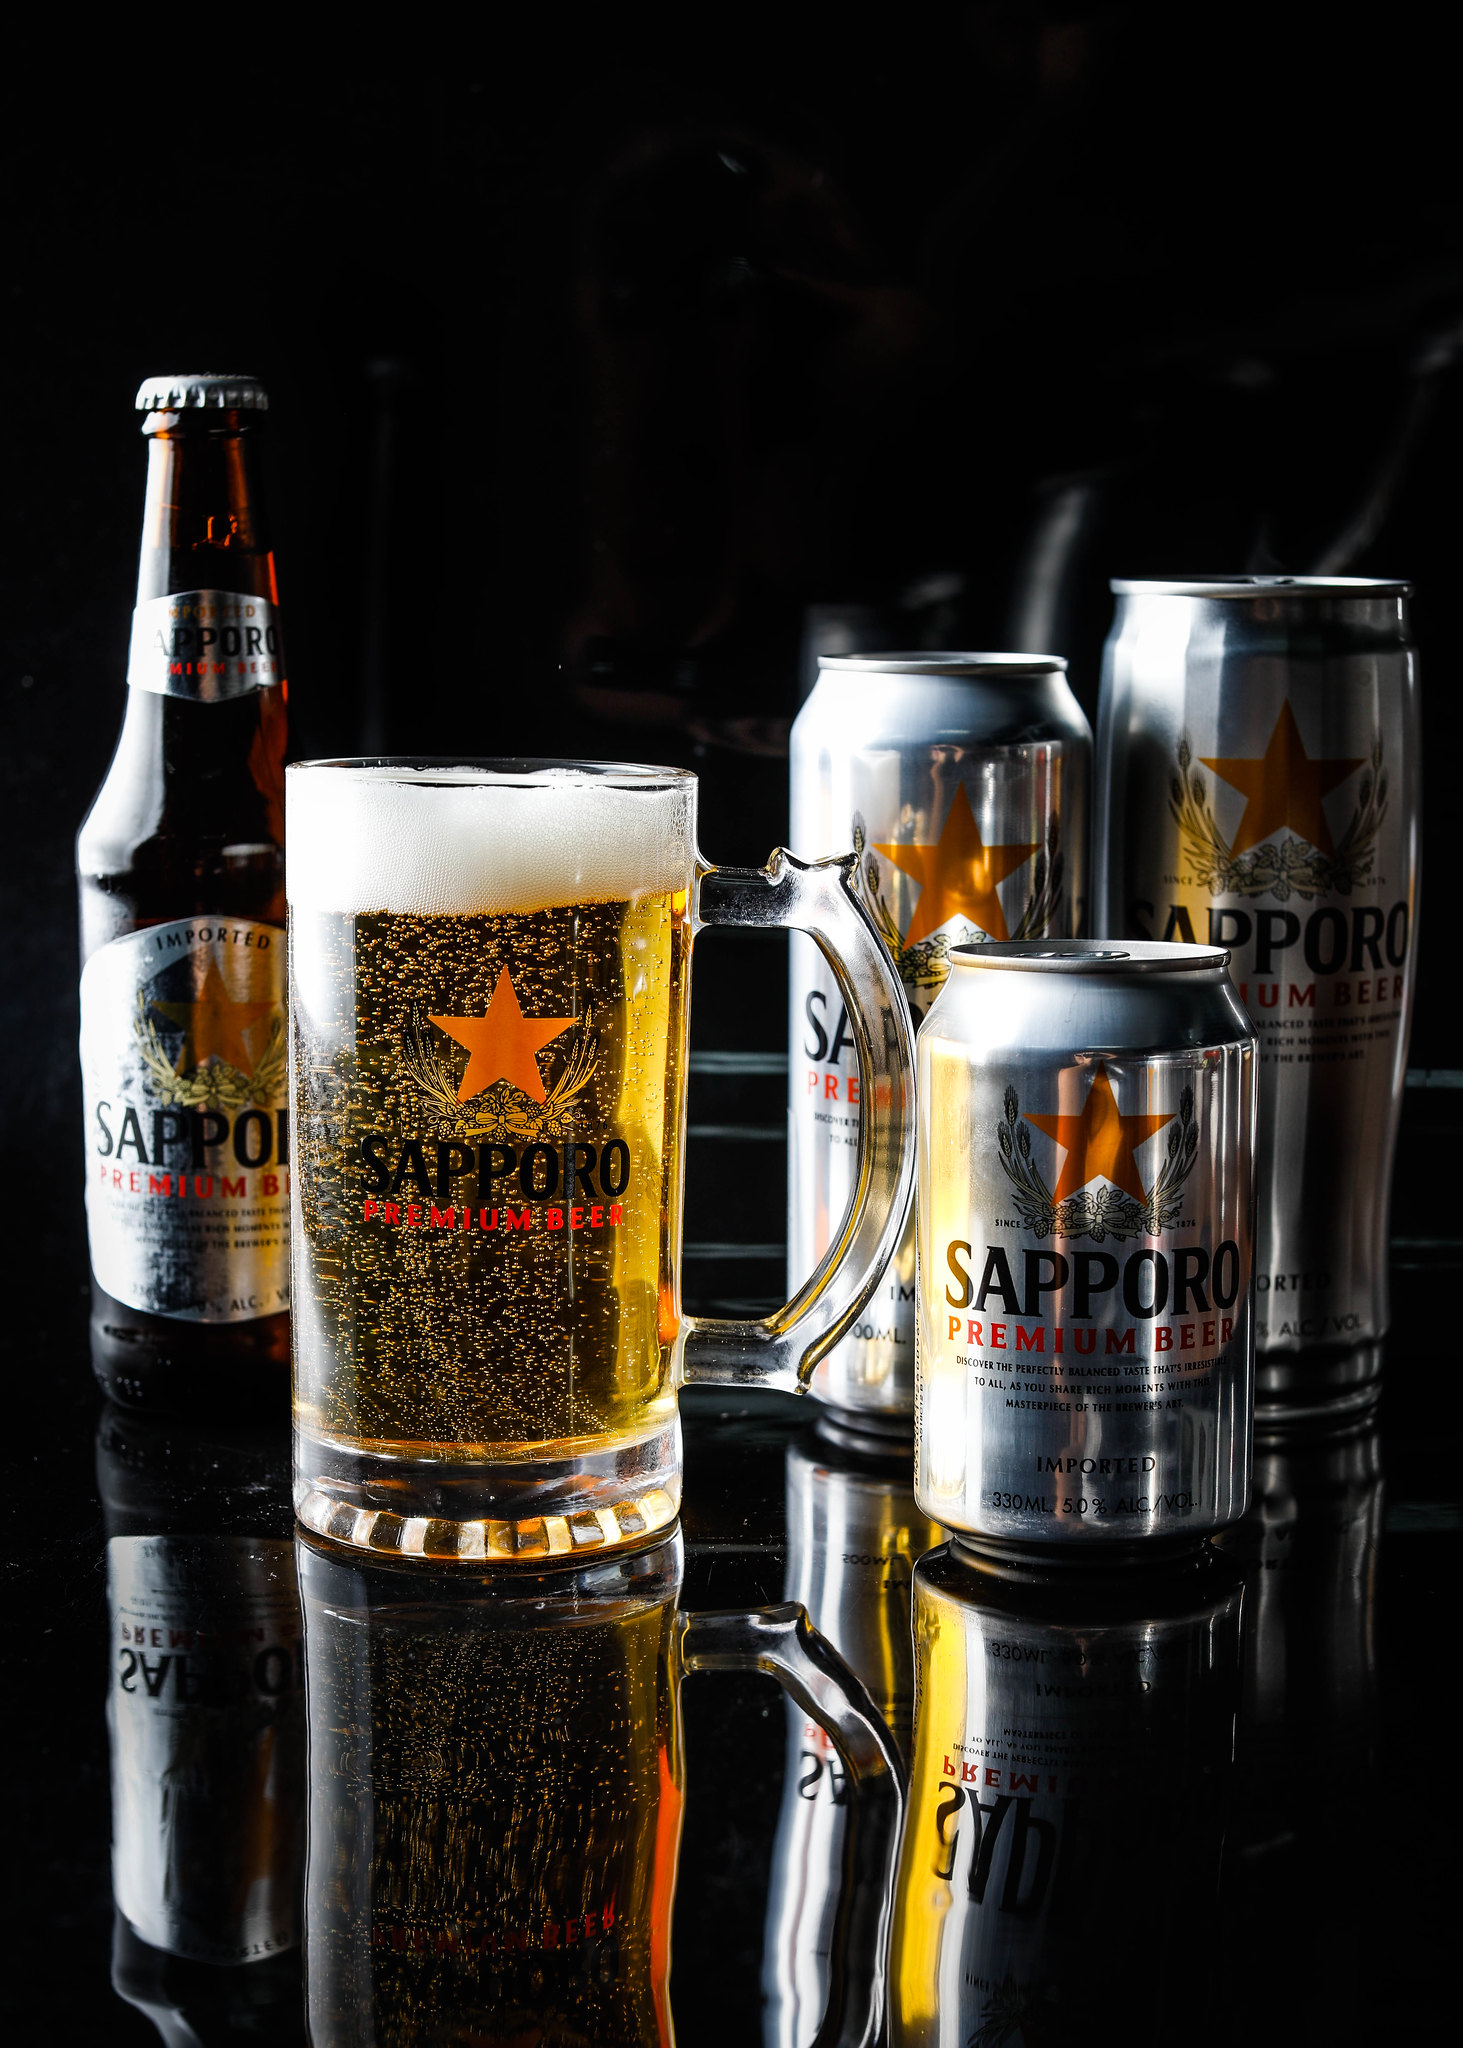 Assorted Sapporo Premium Beer 2